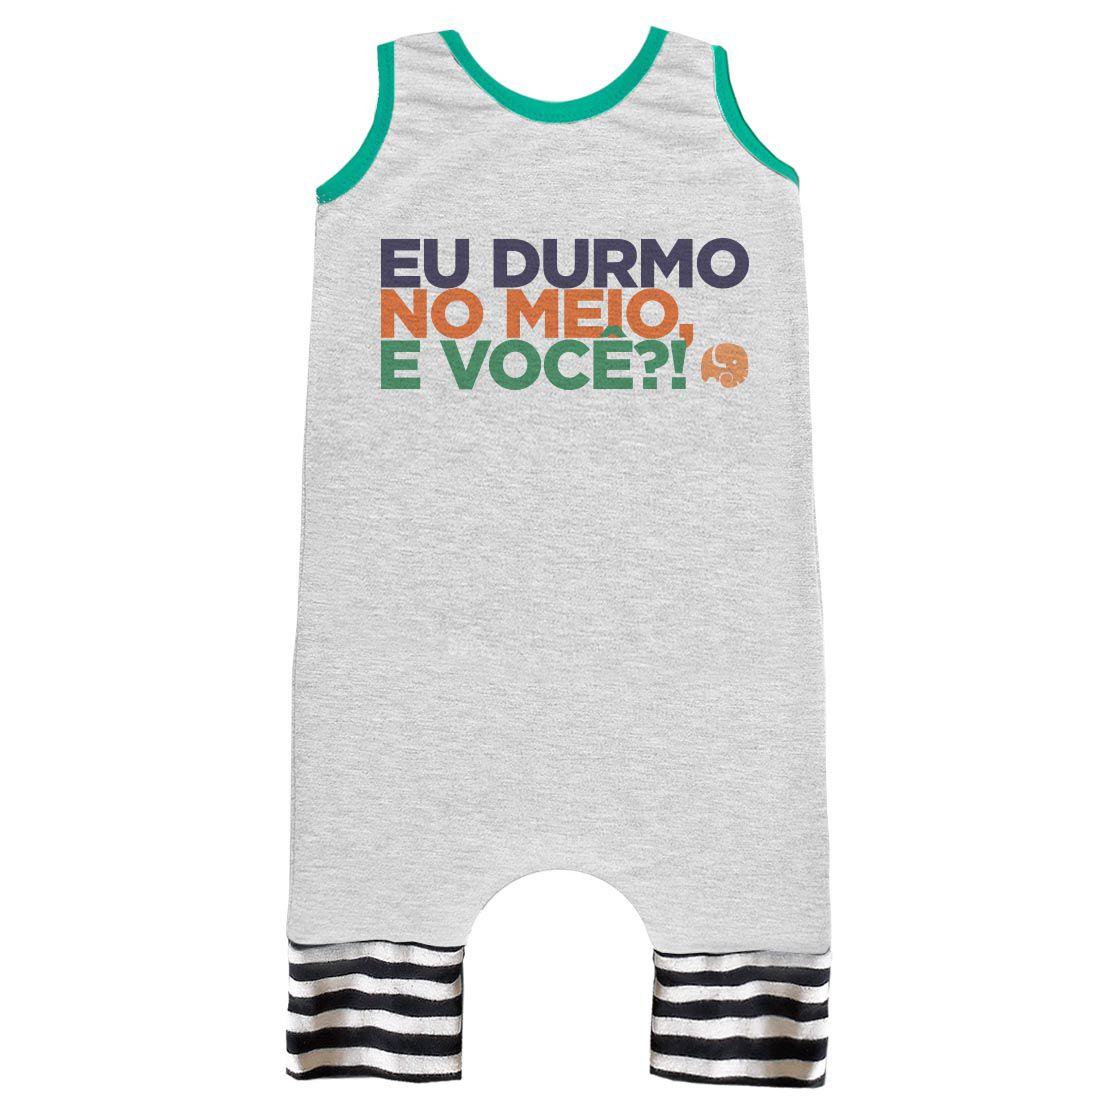 Pijama Regata Comfy Durmo no Meio